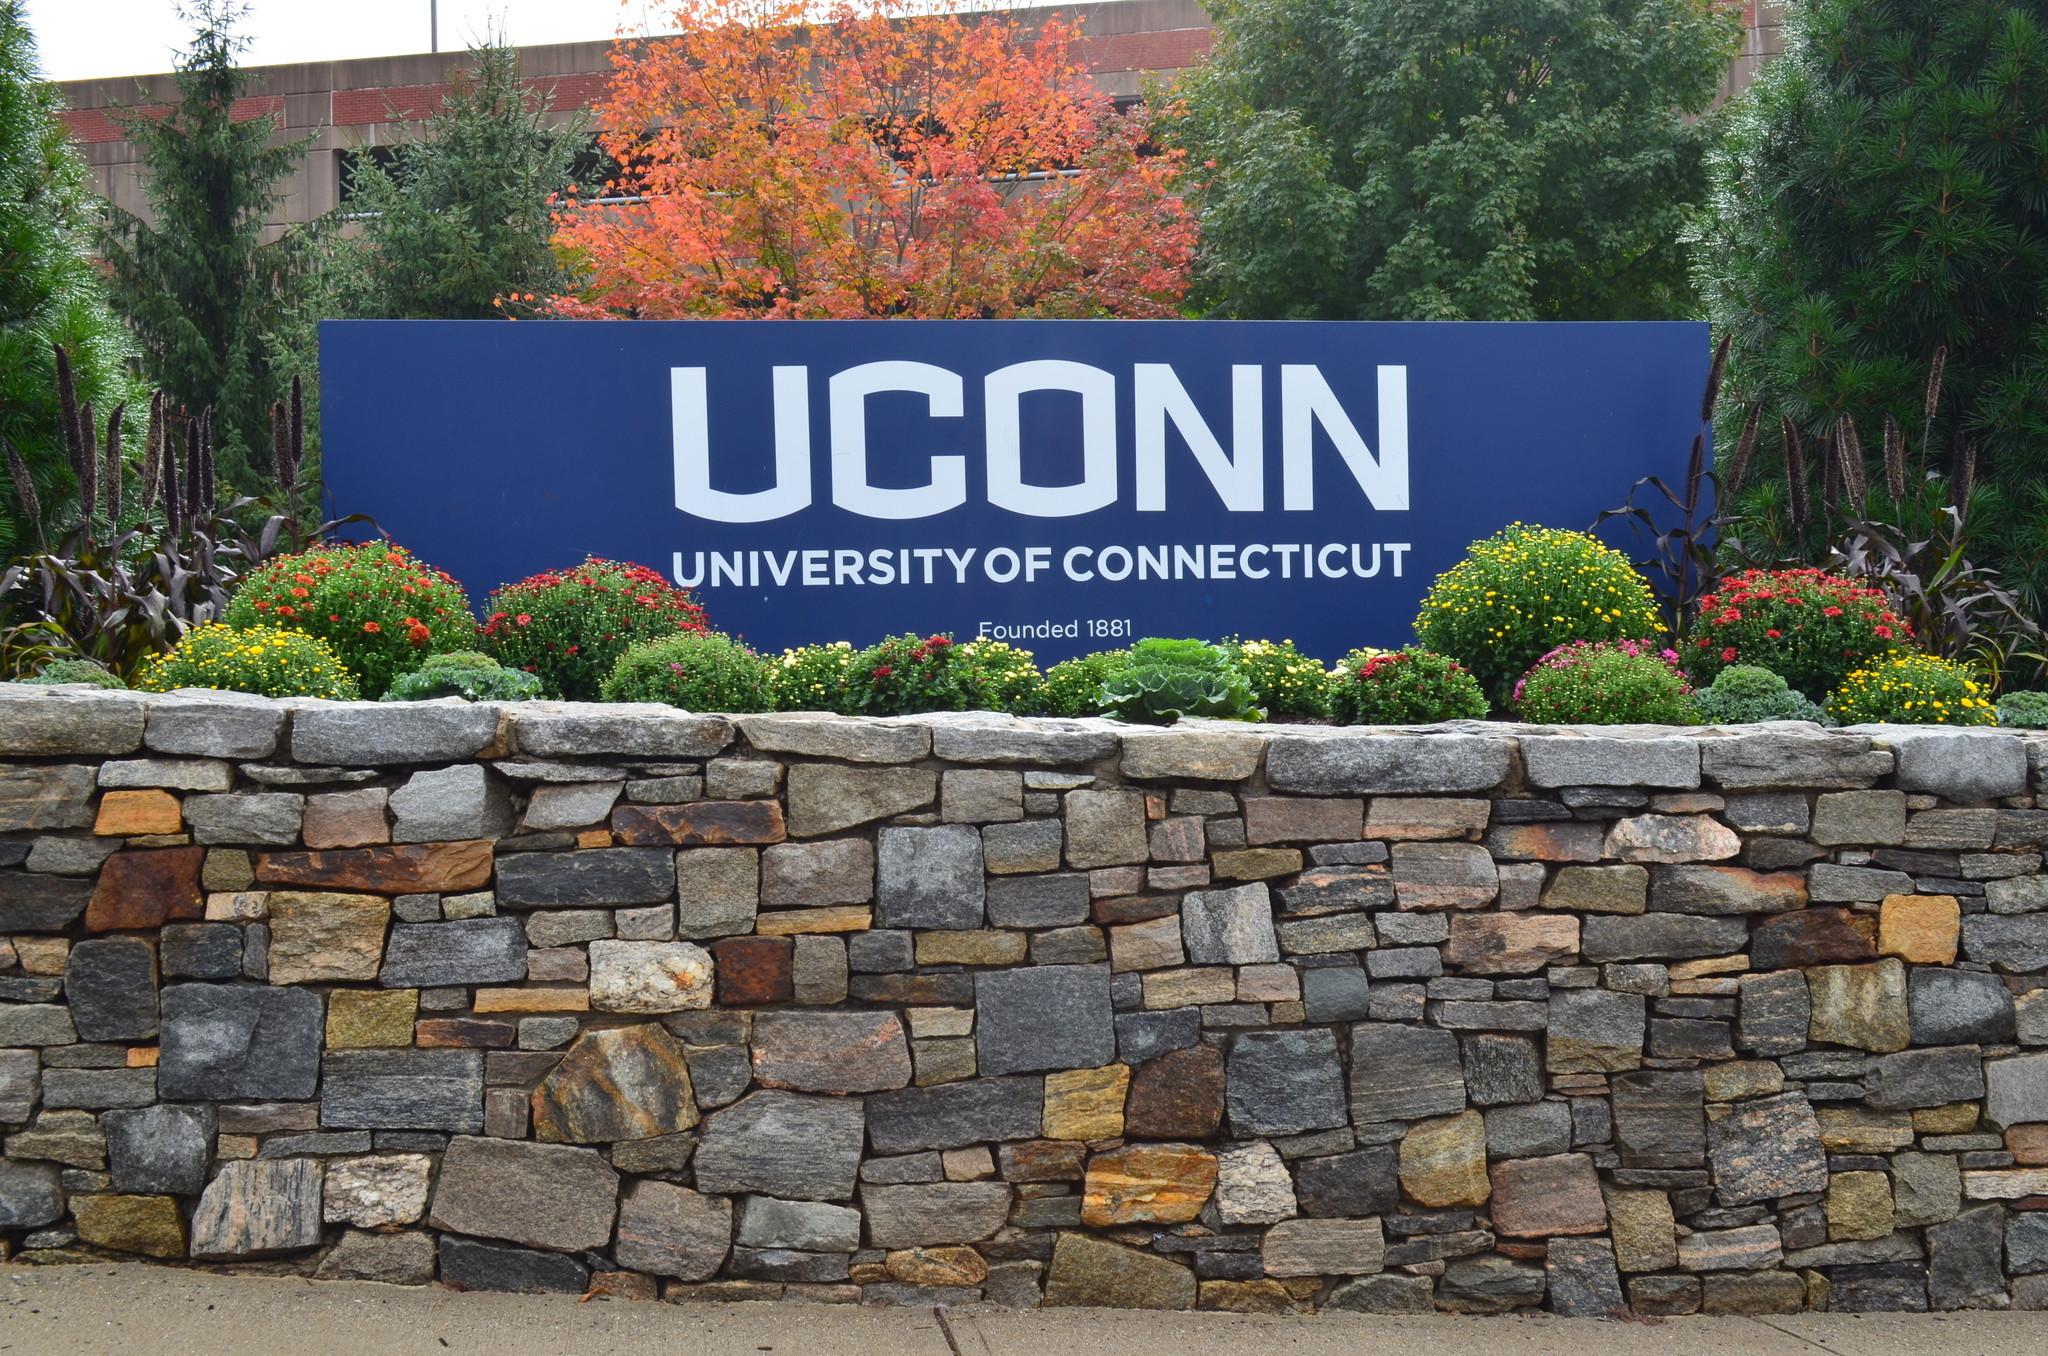 Uconn Graduate School Diversity Officer Out After Giving Husband Fellowship School Confirms